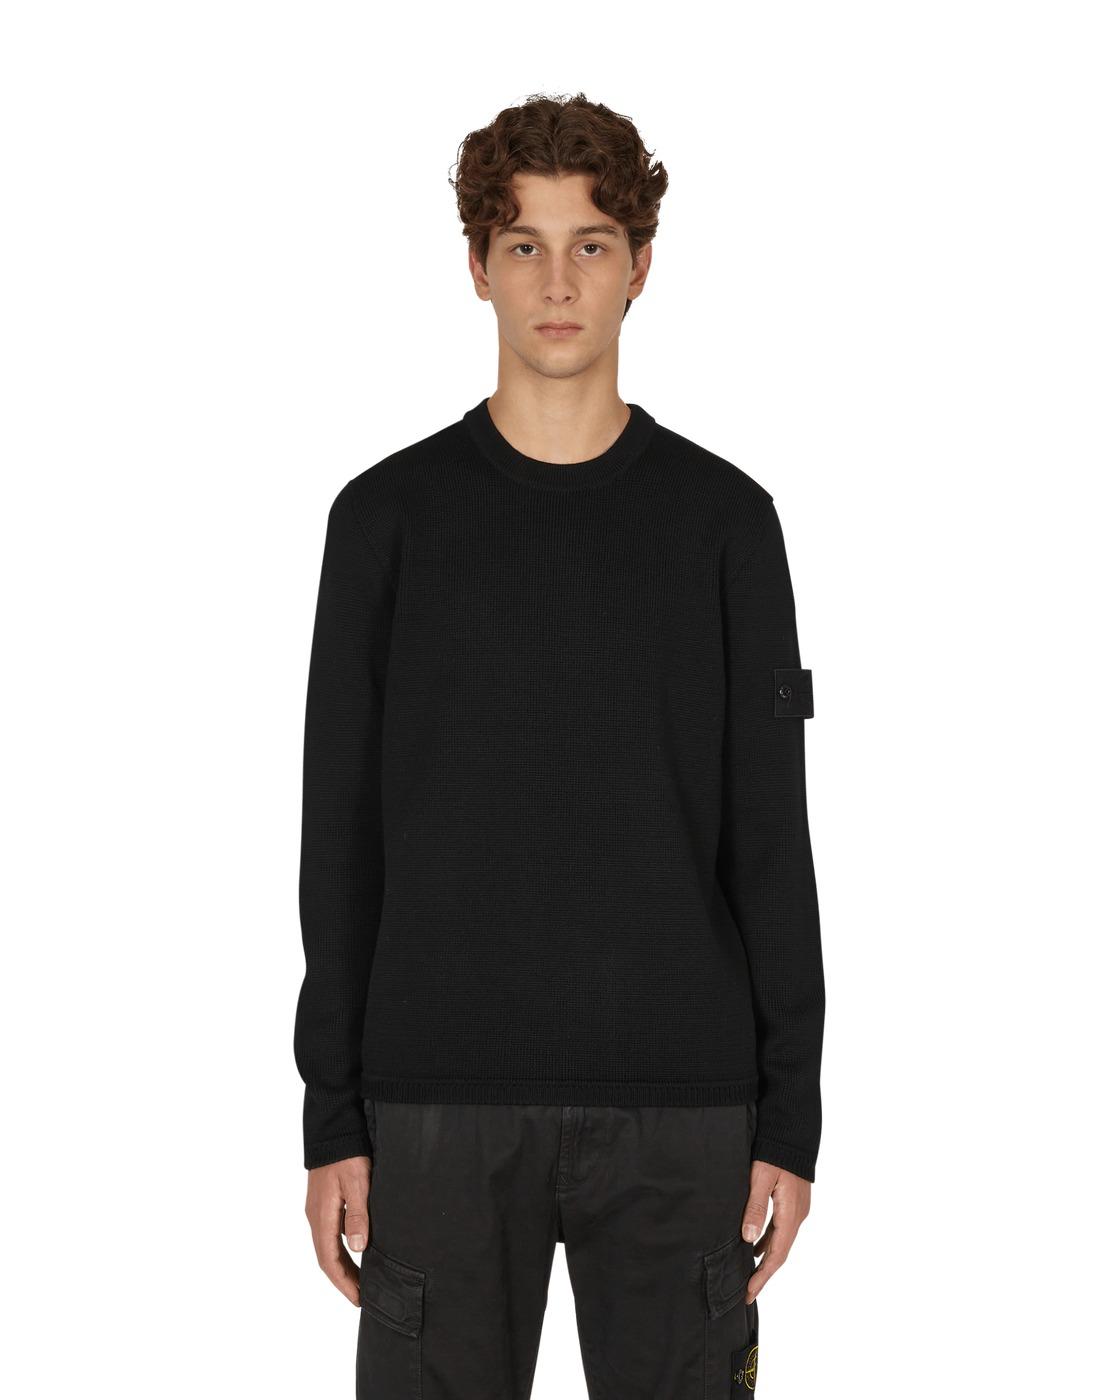 Photo: Stone Island Wool Crewneck Sweater Black